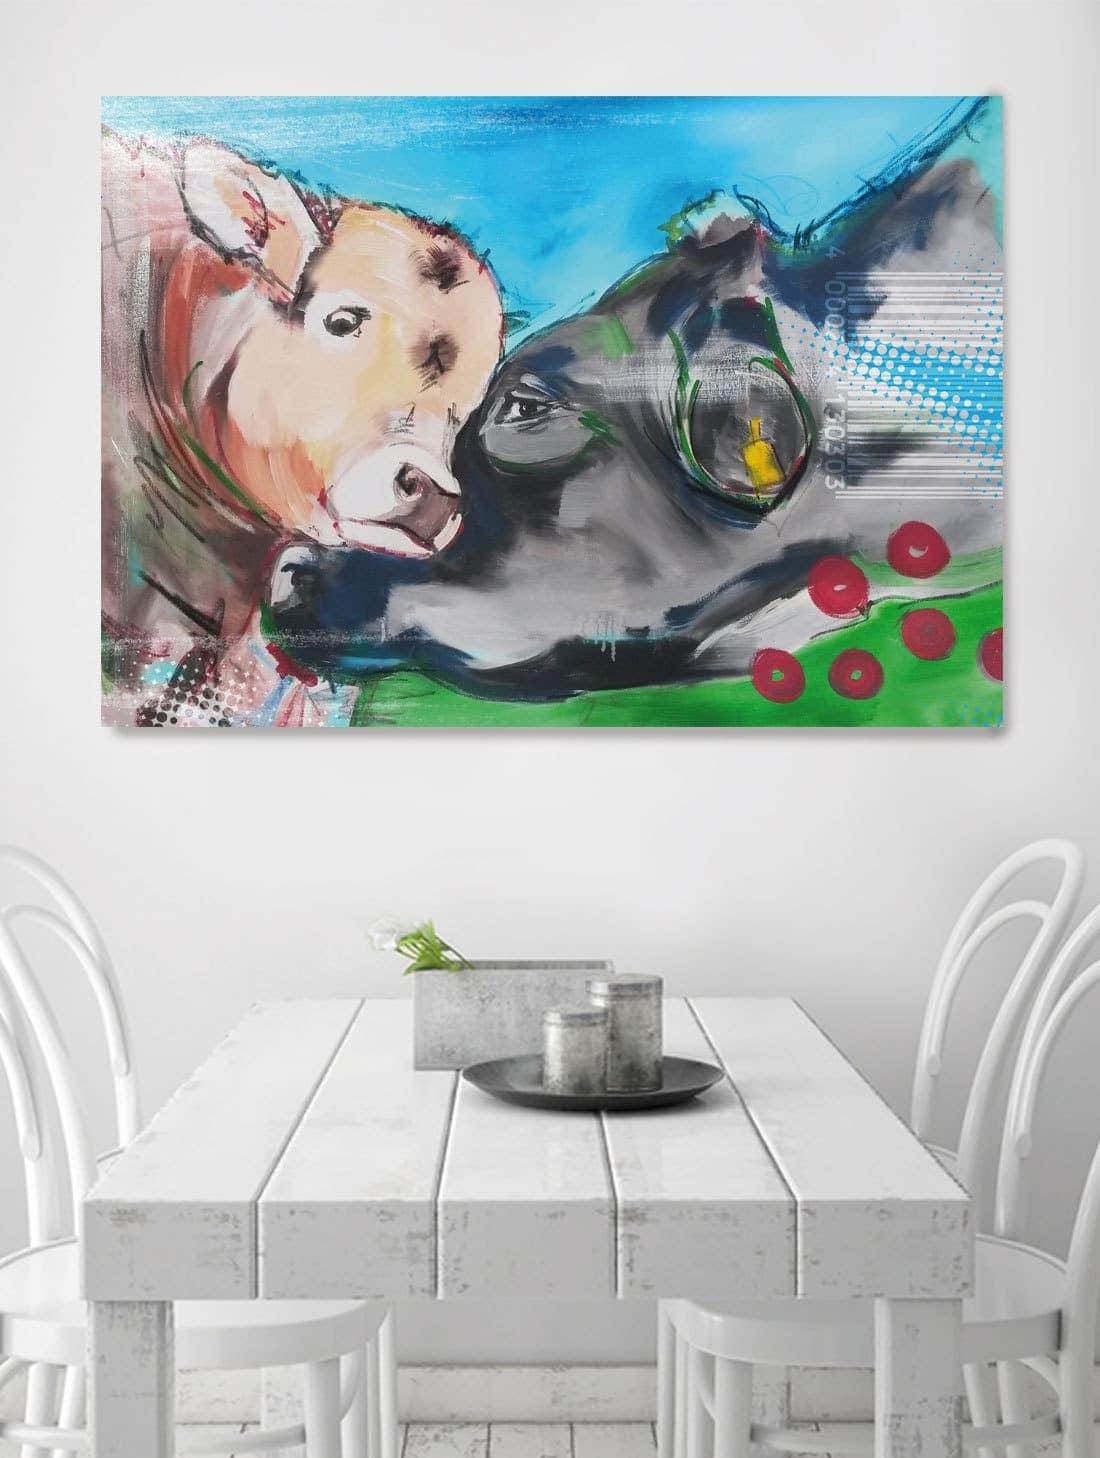 Kunstdruck motiv kuh und kalb auf leinwand kuh bilder auf leinwand - Kuh bilder auf leinwand ...